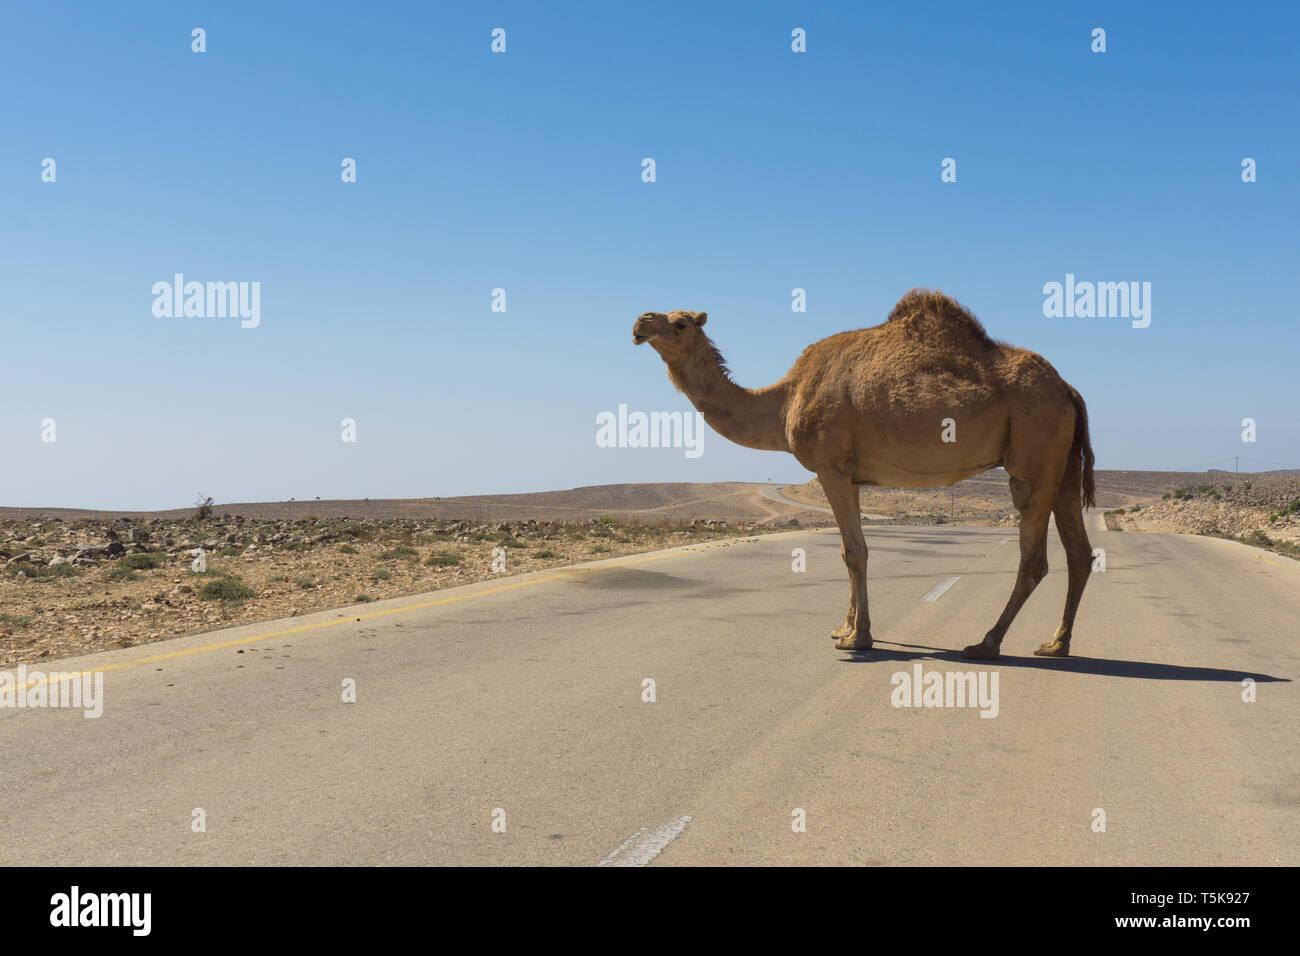 Camels on road, Salalah, Dhorfar, Oman Stock Photo